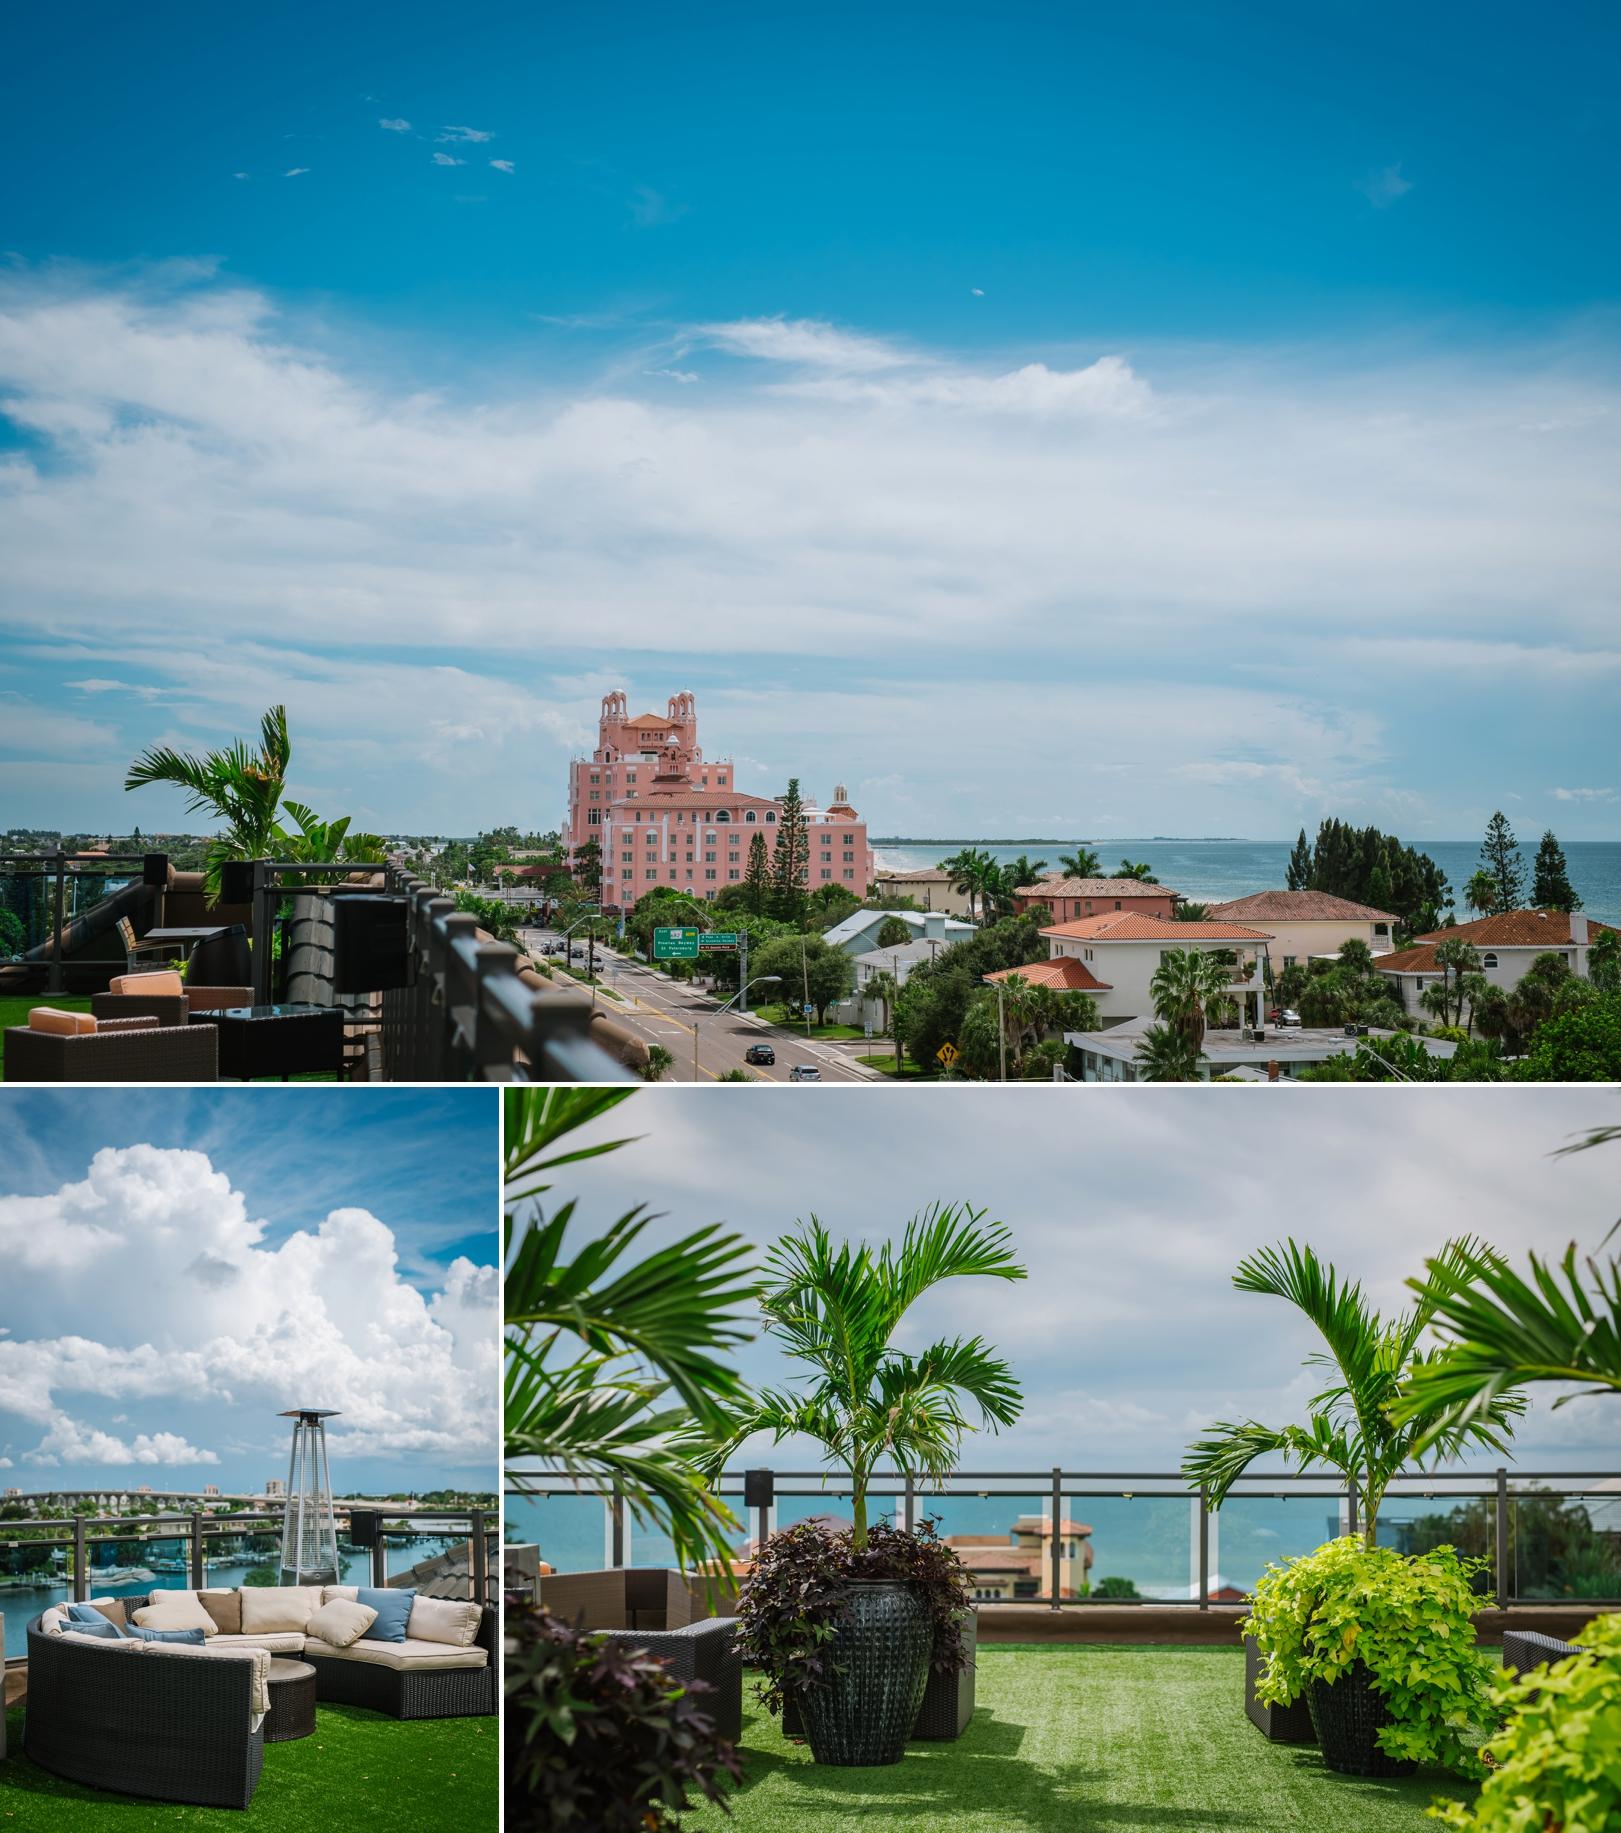 st-pete-hotel-zamora-sunken-gardens-rooftop-wedding-photography_0000.jpg